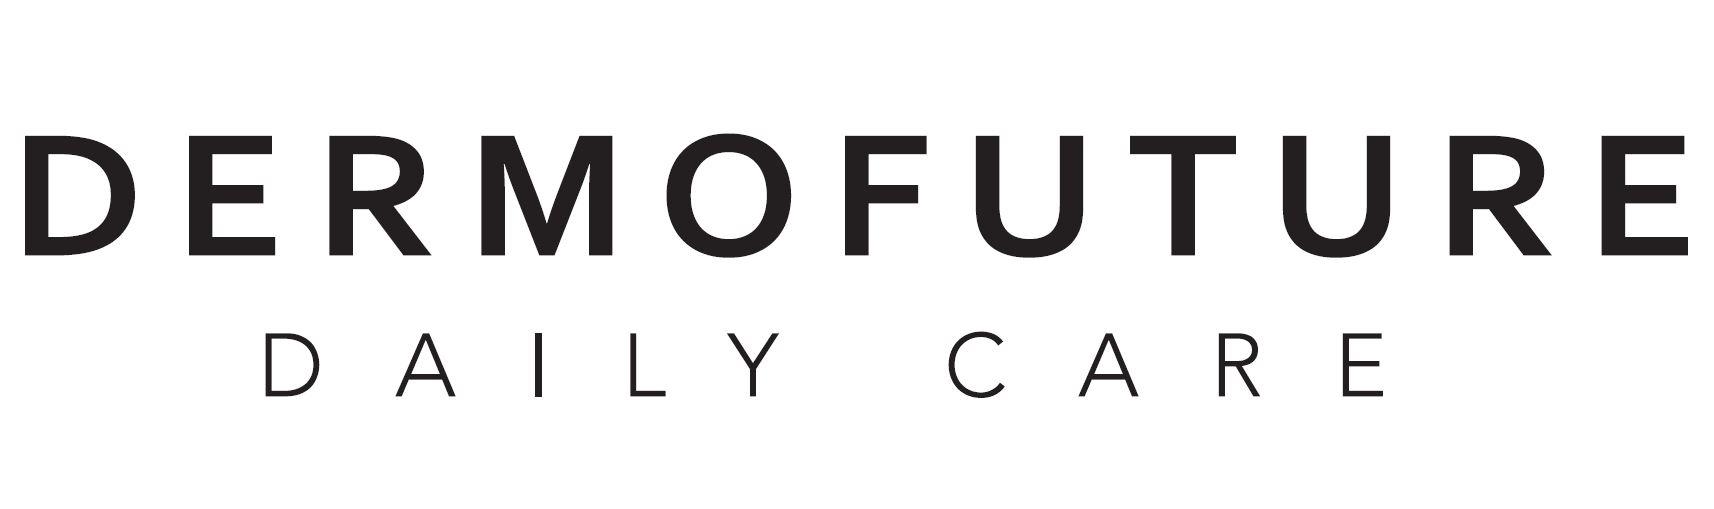 Logo Dermofuture Daily CareJPG